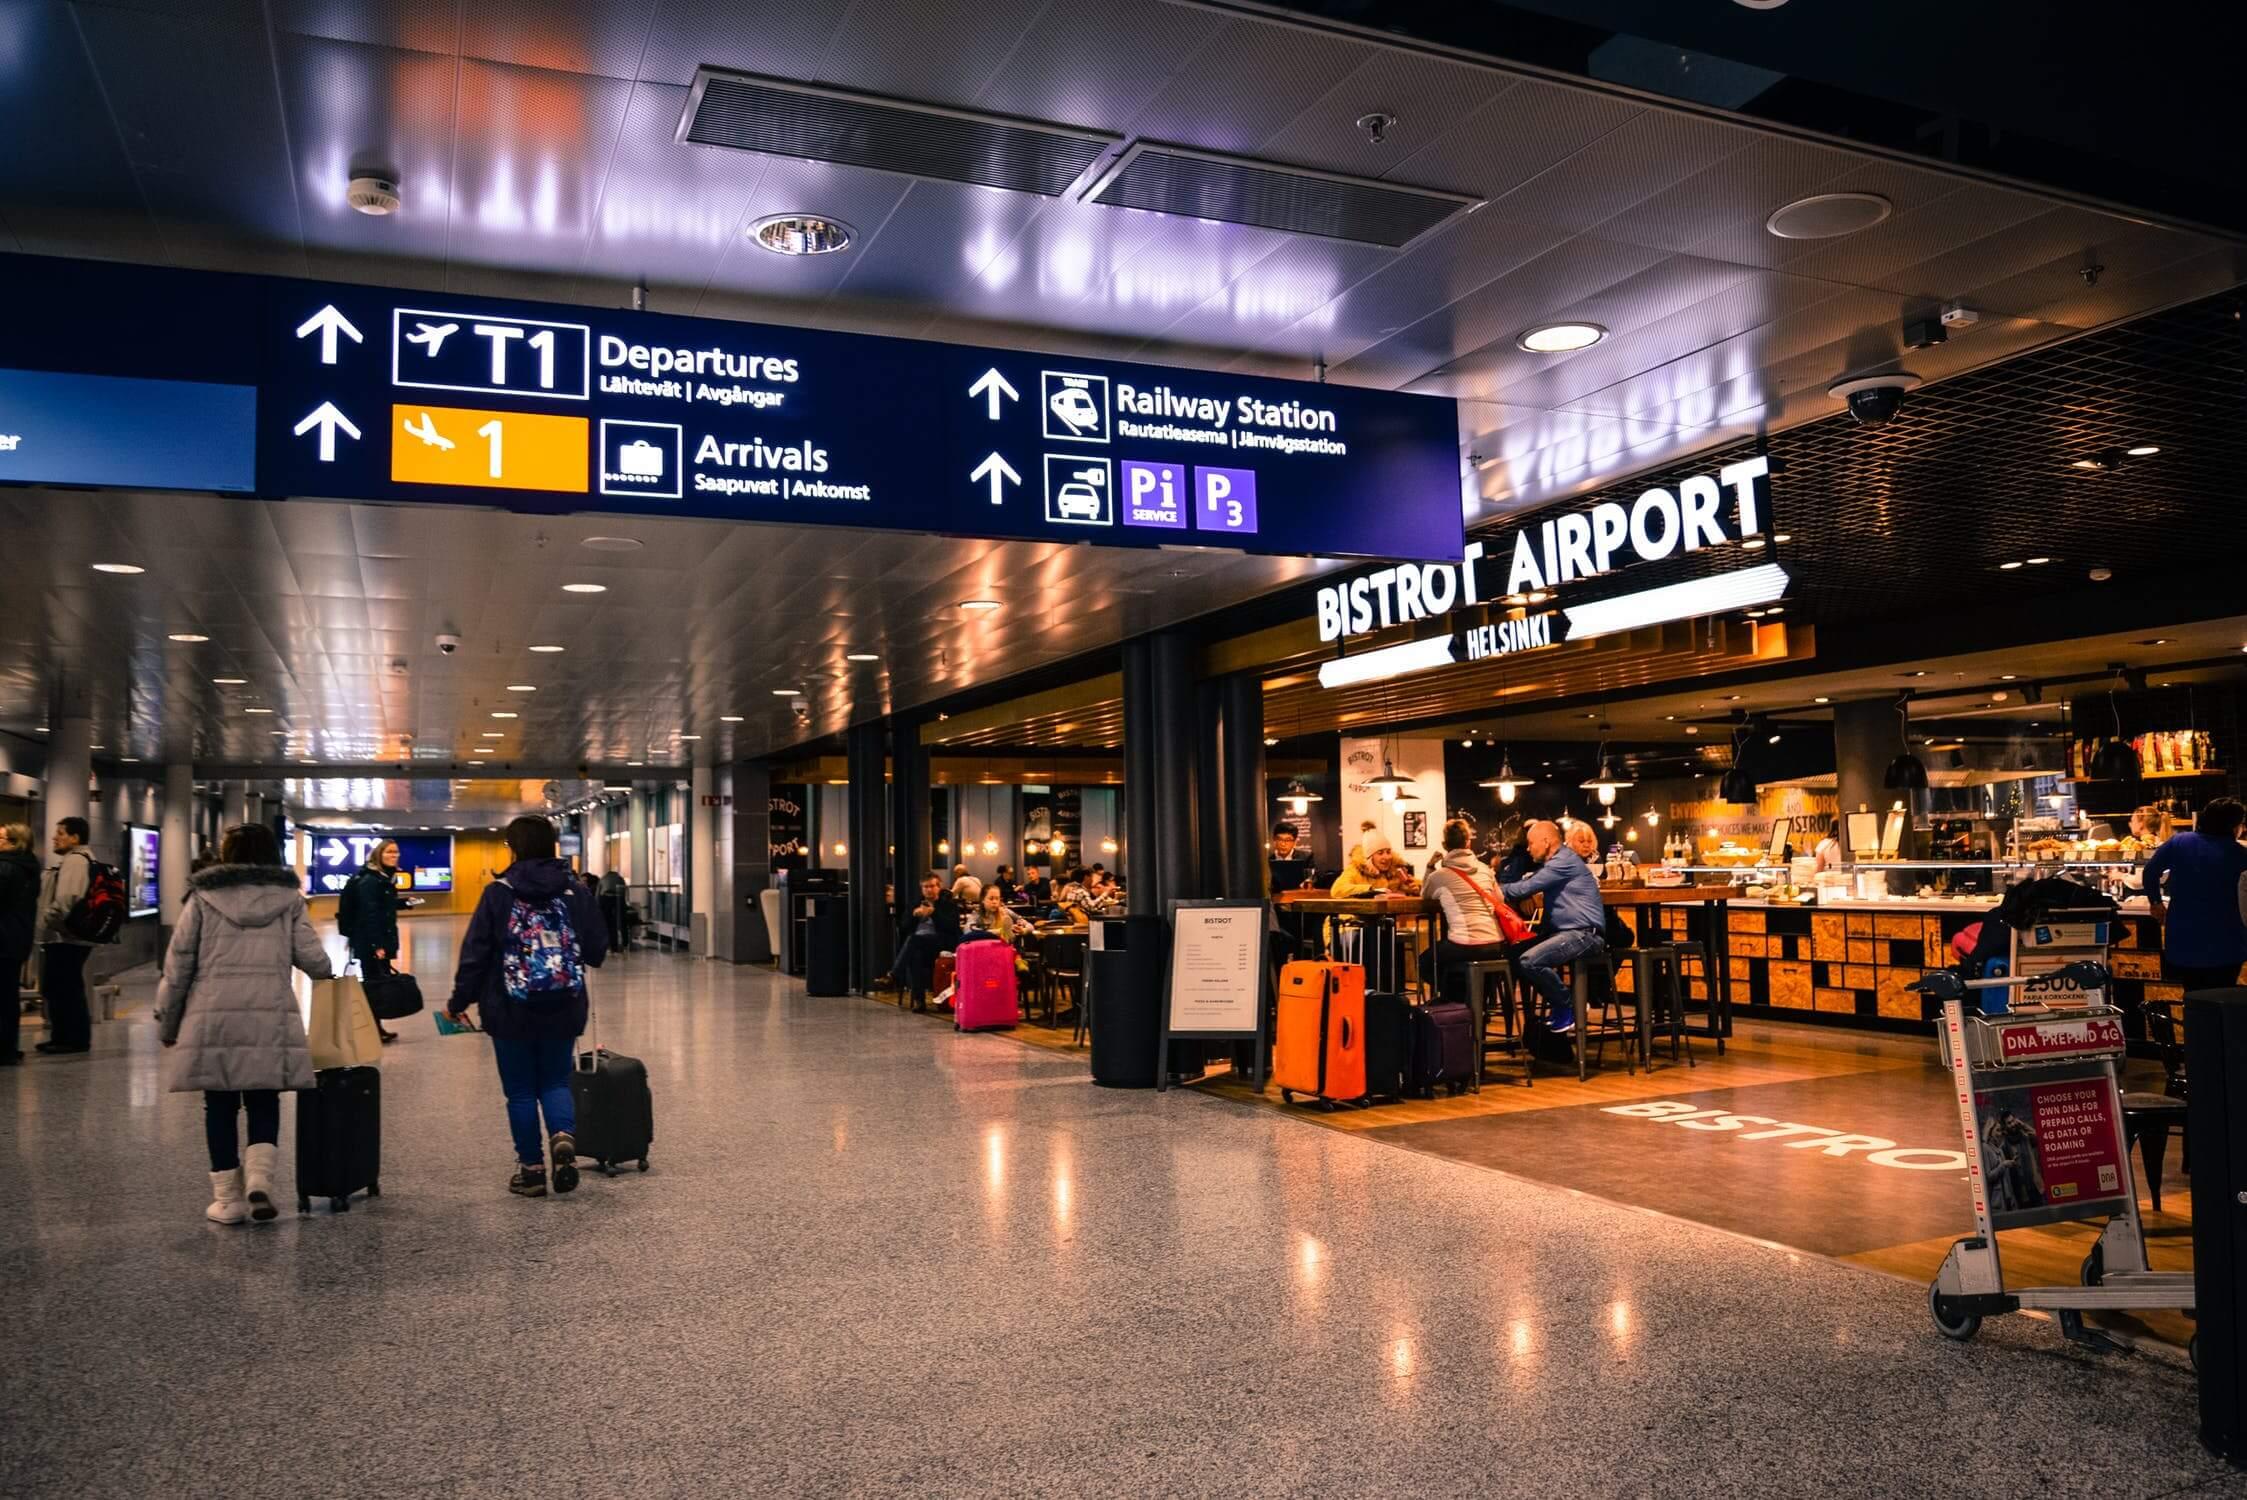 Bistrot Airport Helsinki